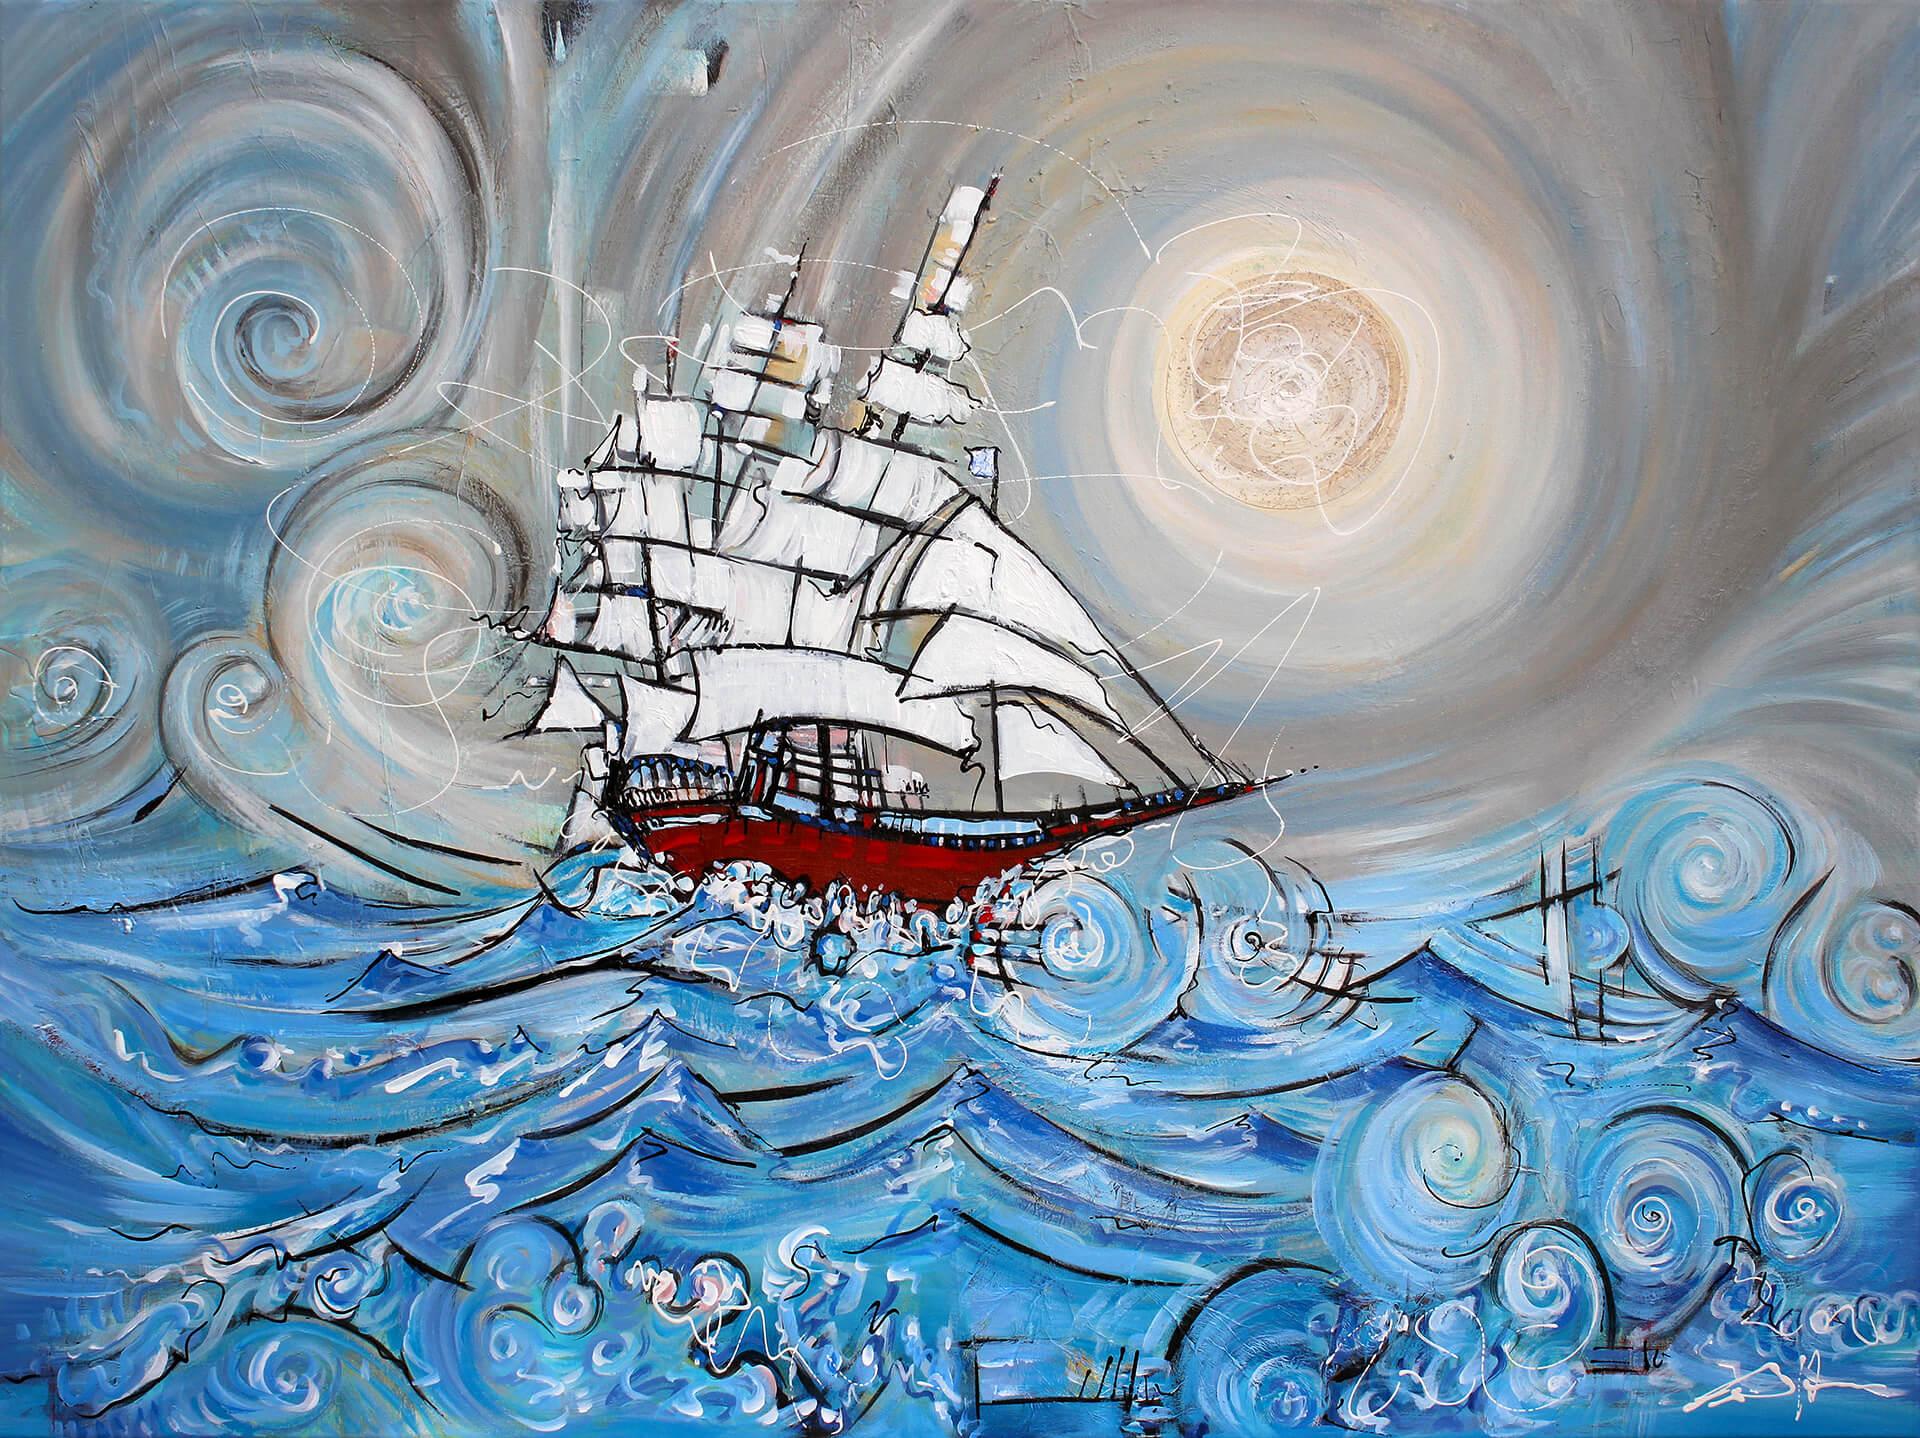 art-eric-j-hughes-artiste-peintre-canadien-tableau-symbiose-tumulte